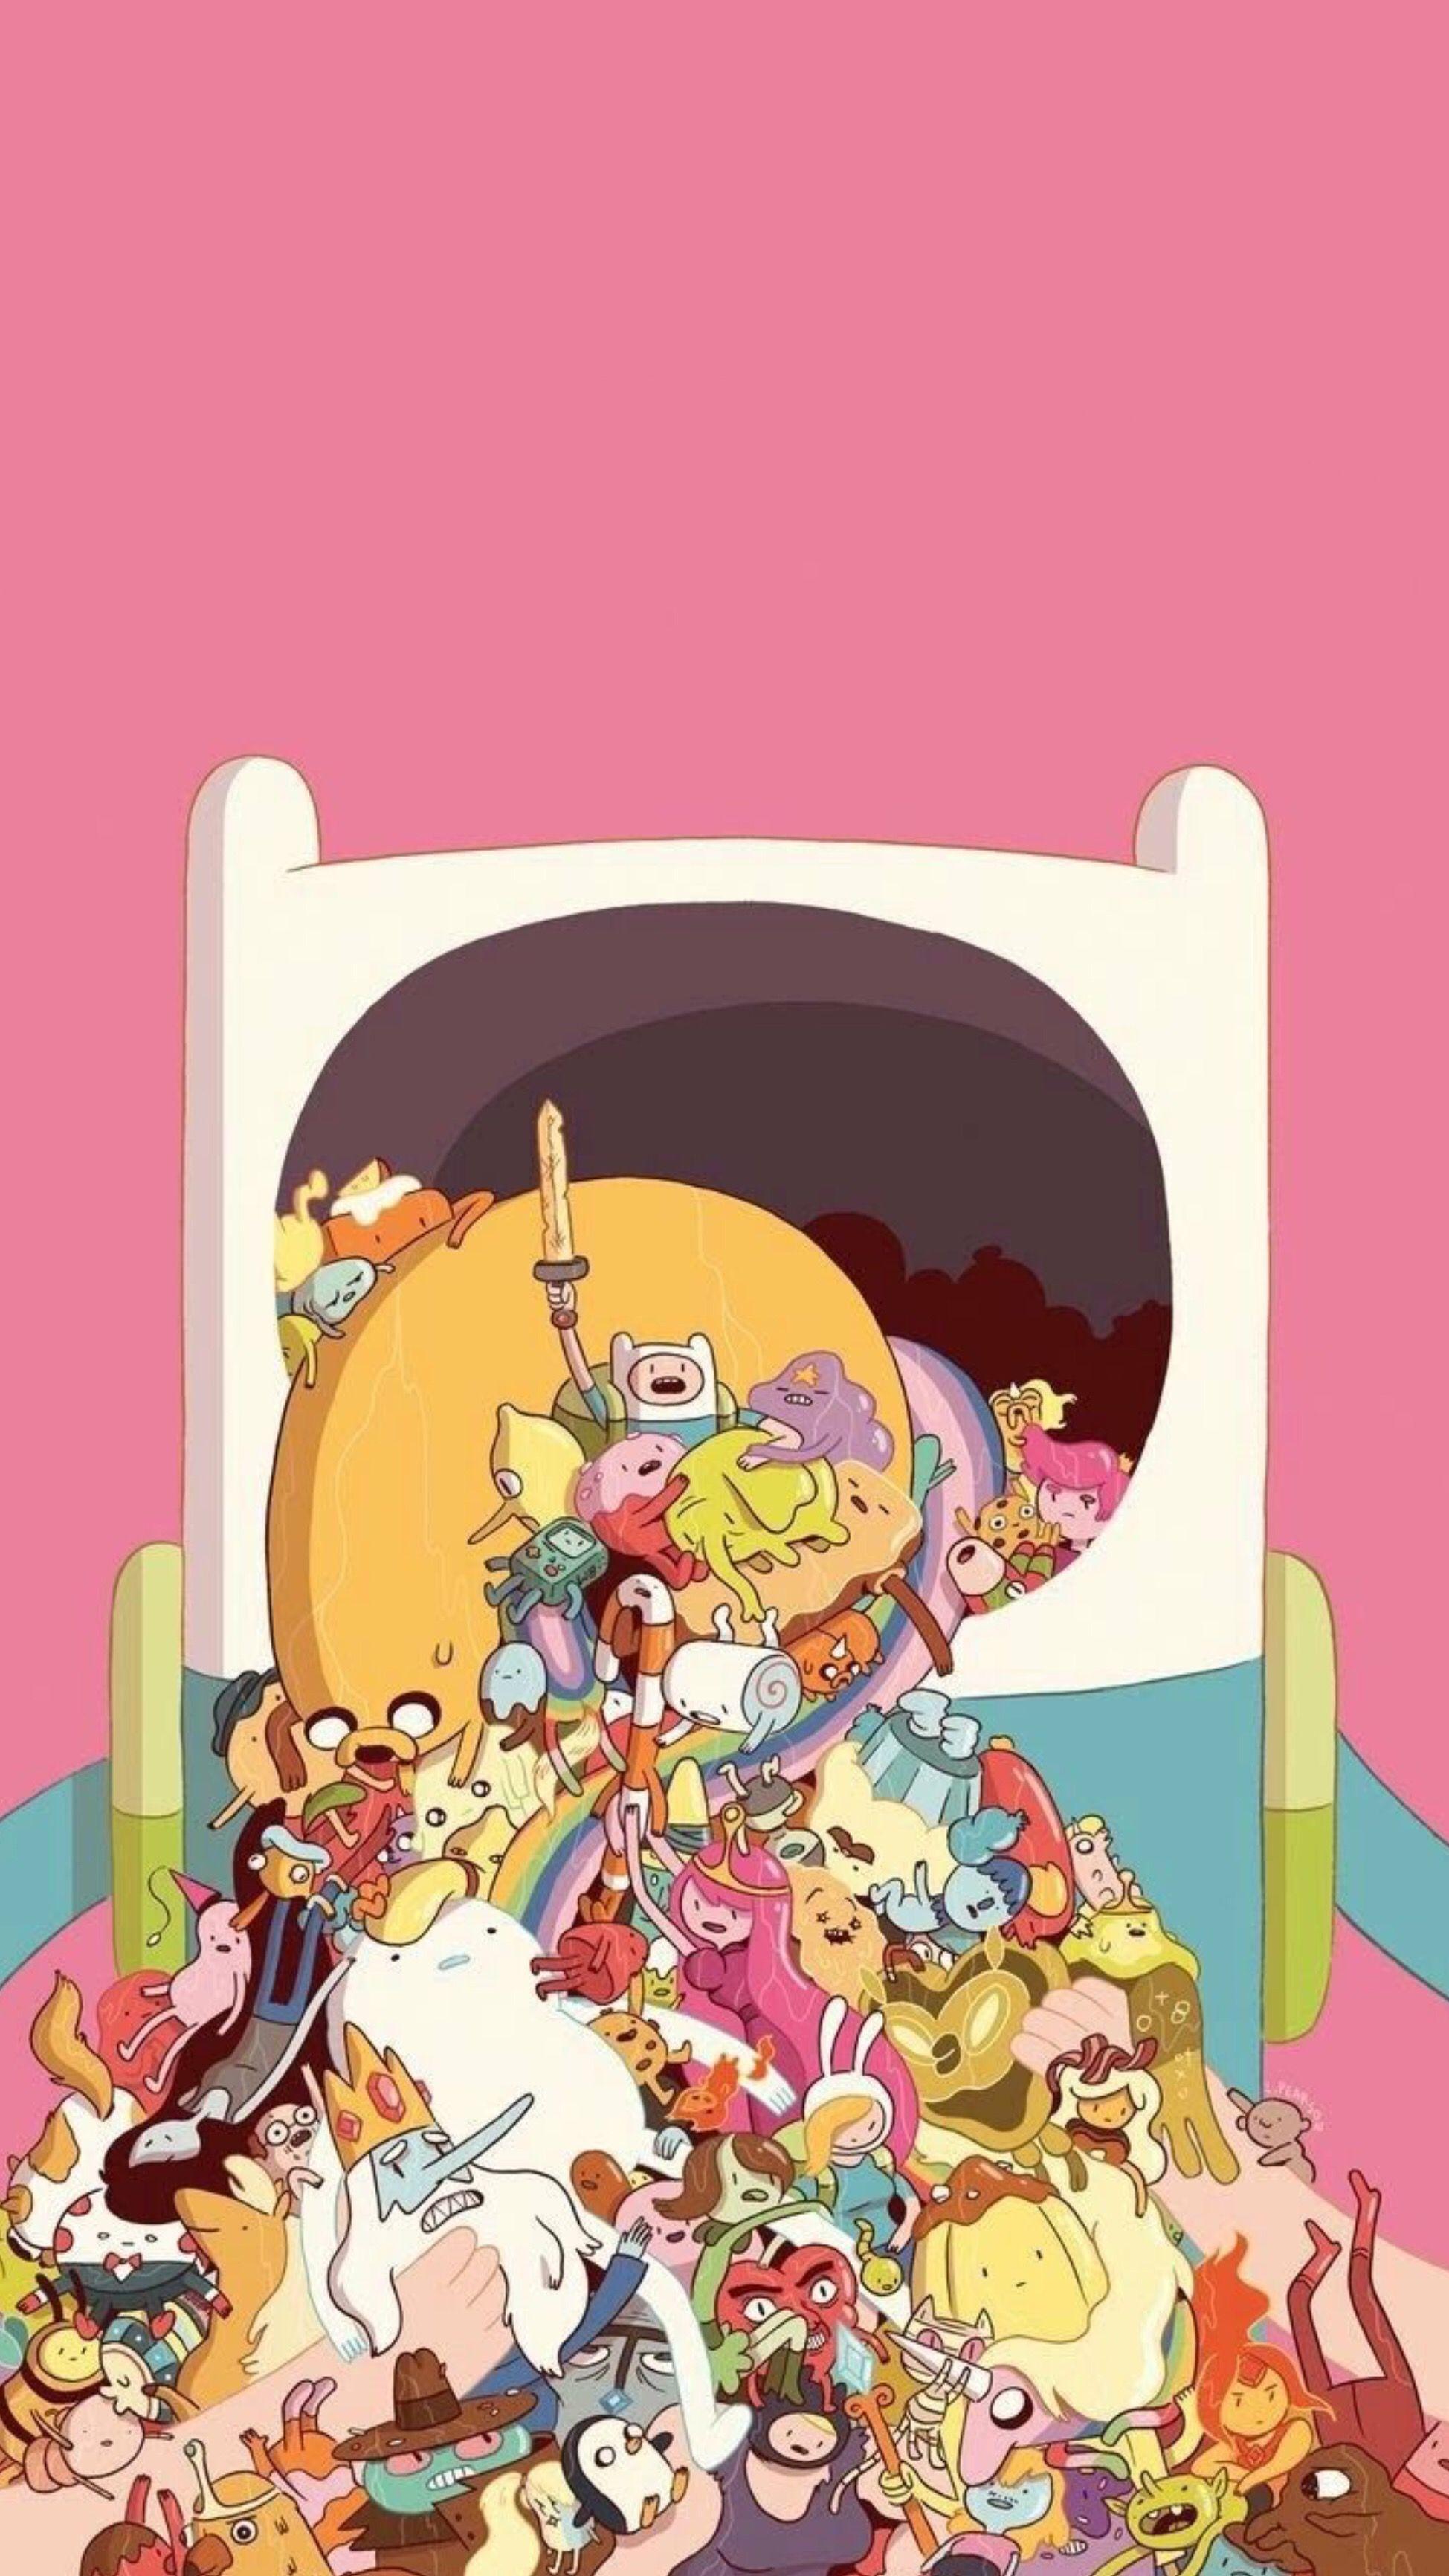 Pin by j on fonds d'écran Adventure time wallpaper